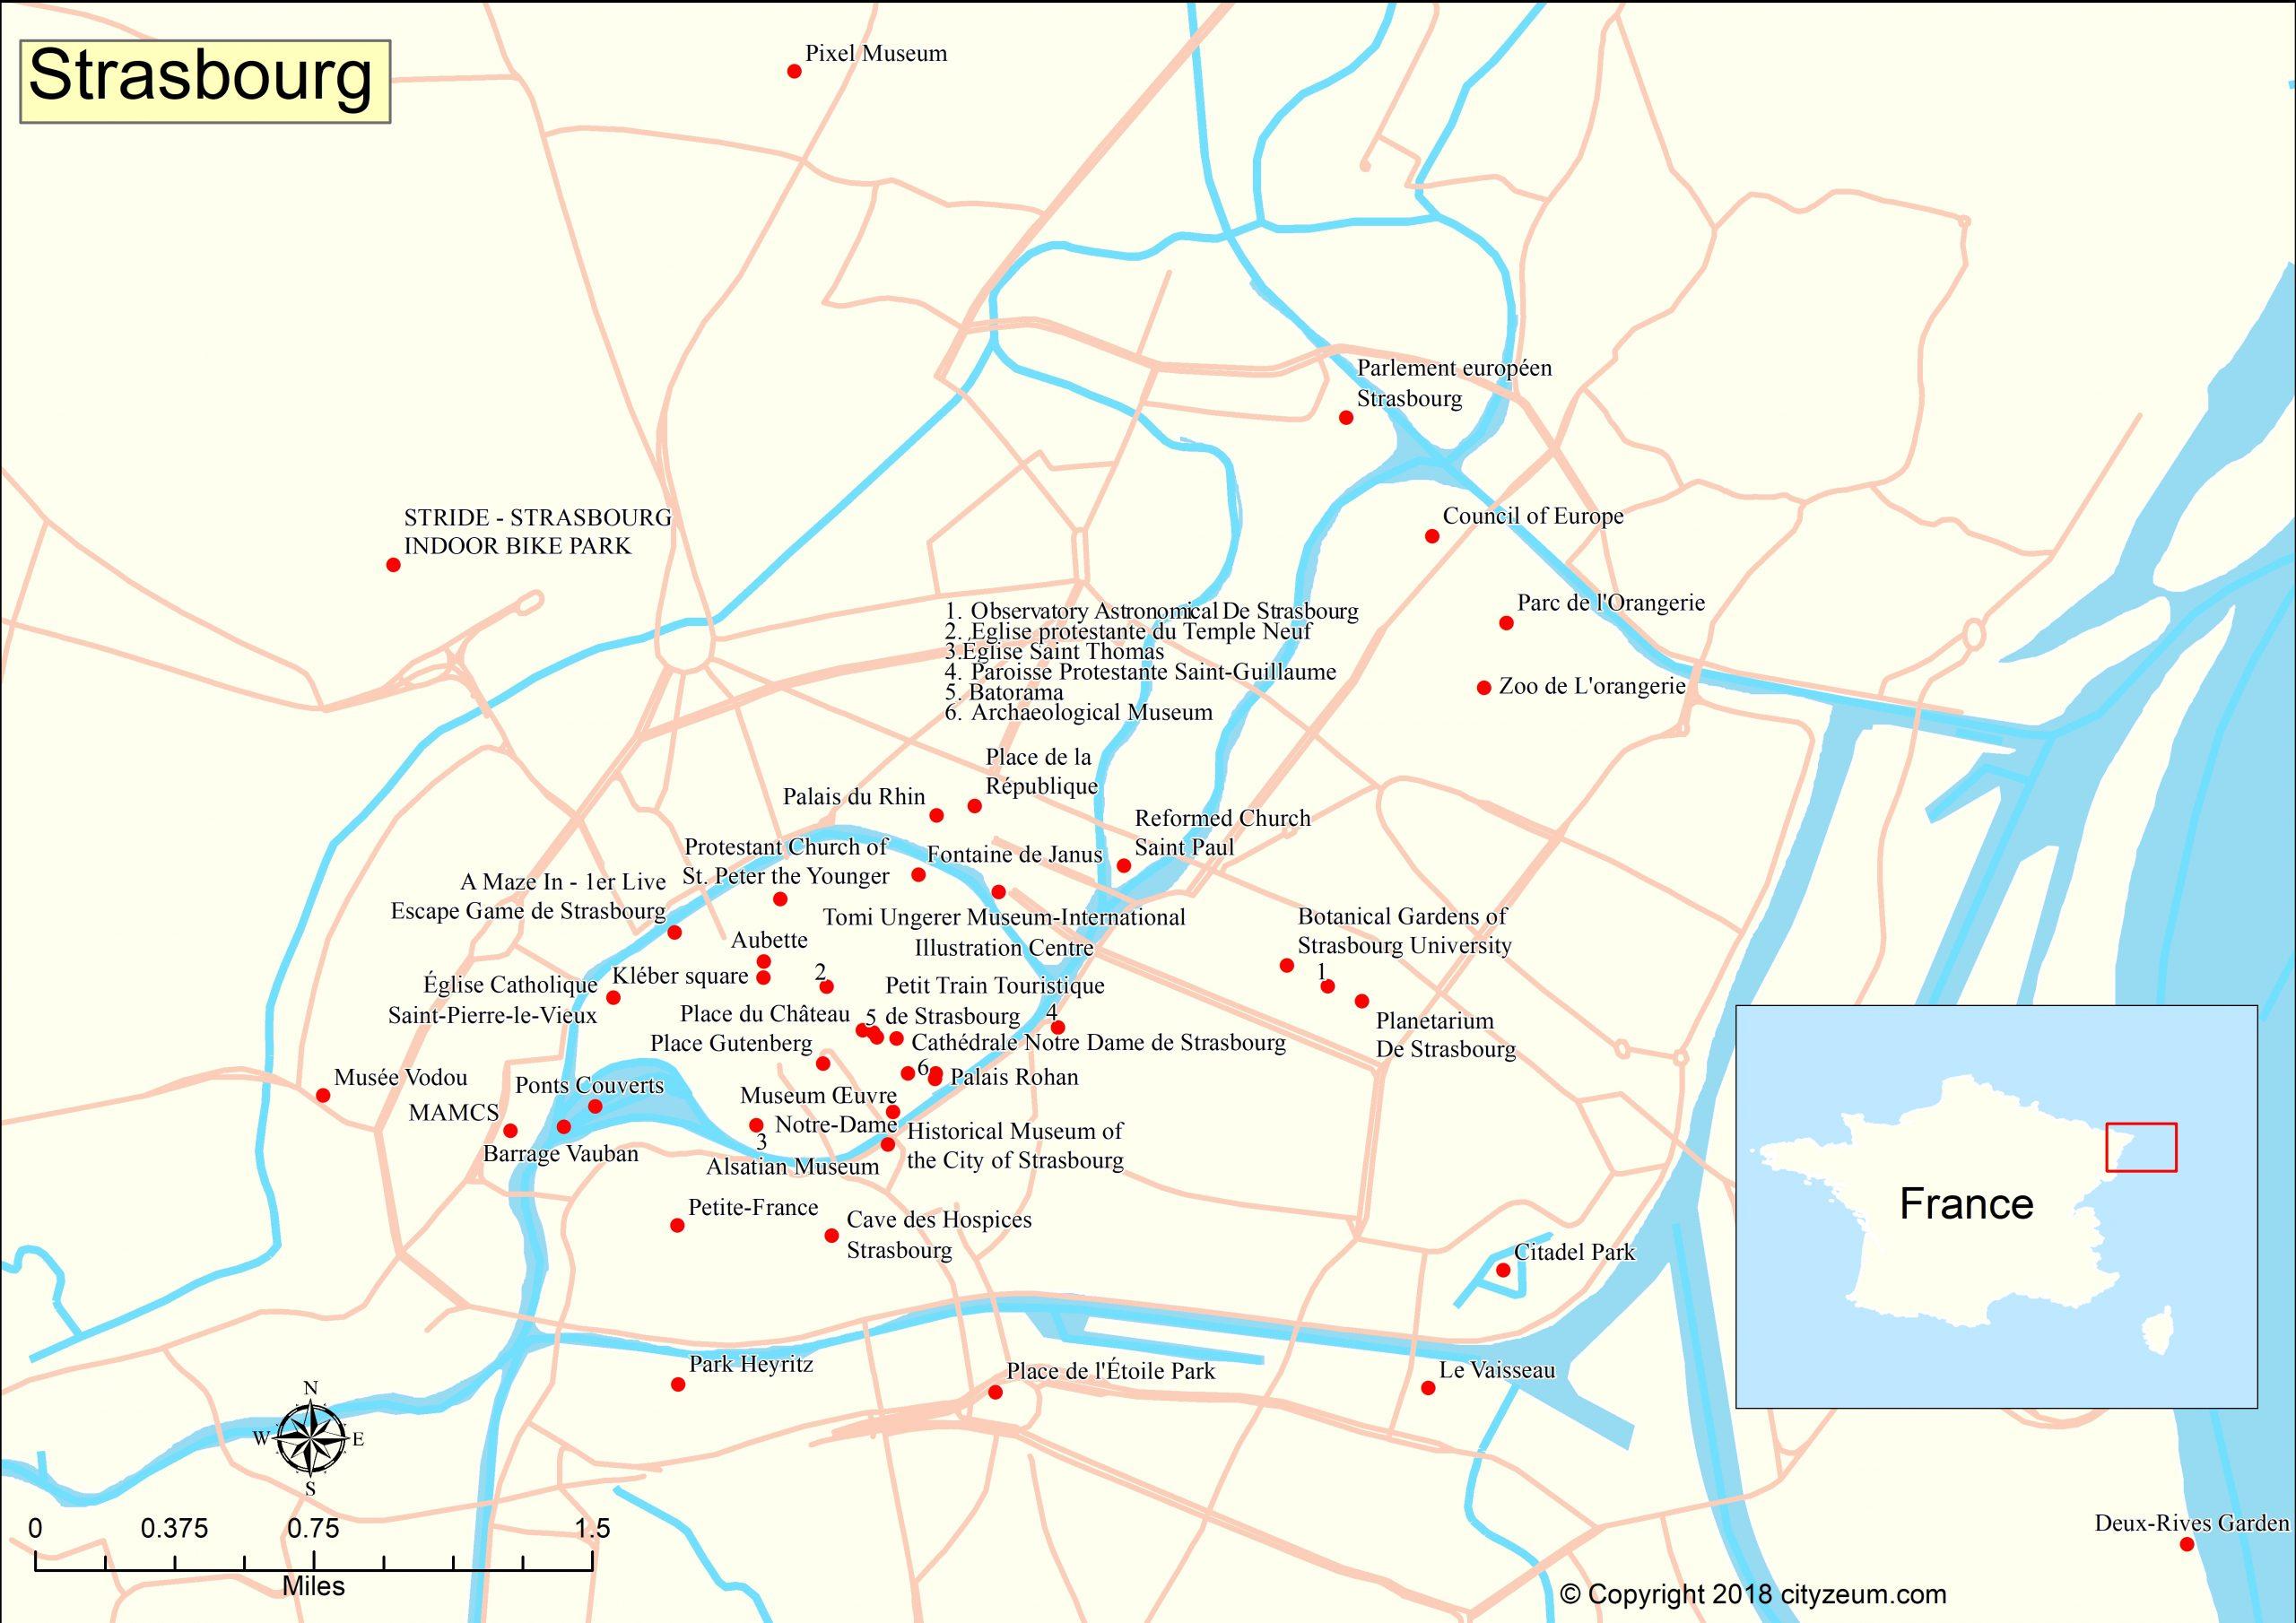 Carte De Strasbourg : Plan Touristique Strasbourg tout Petite Carte De France A Imprimer